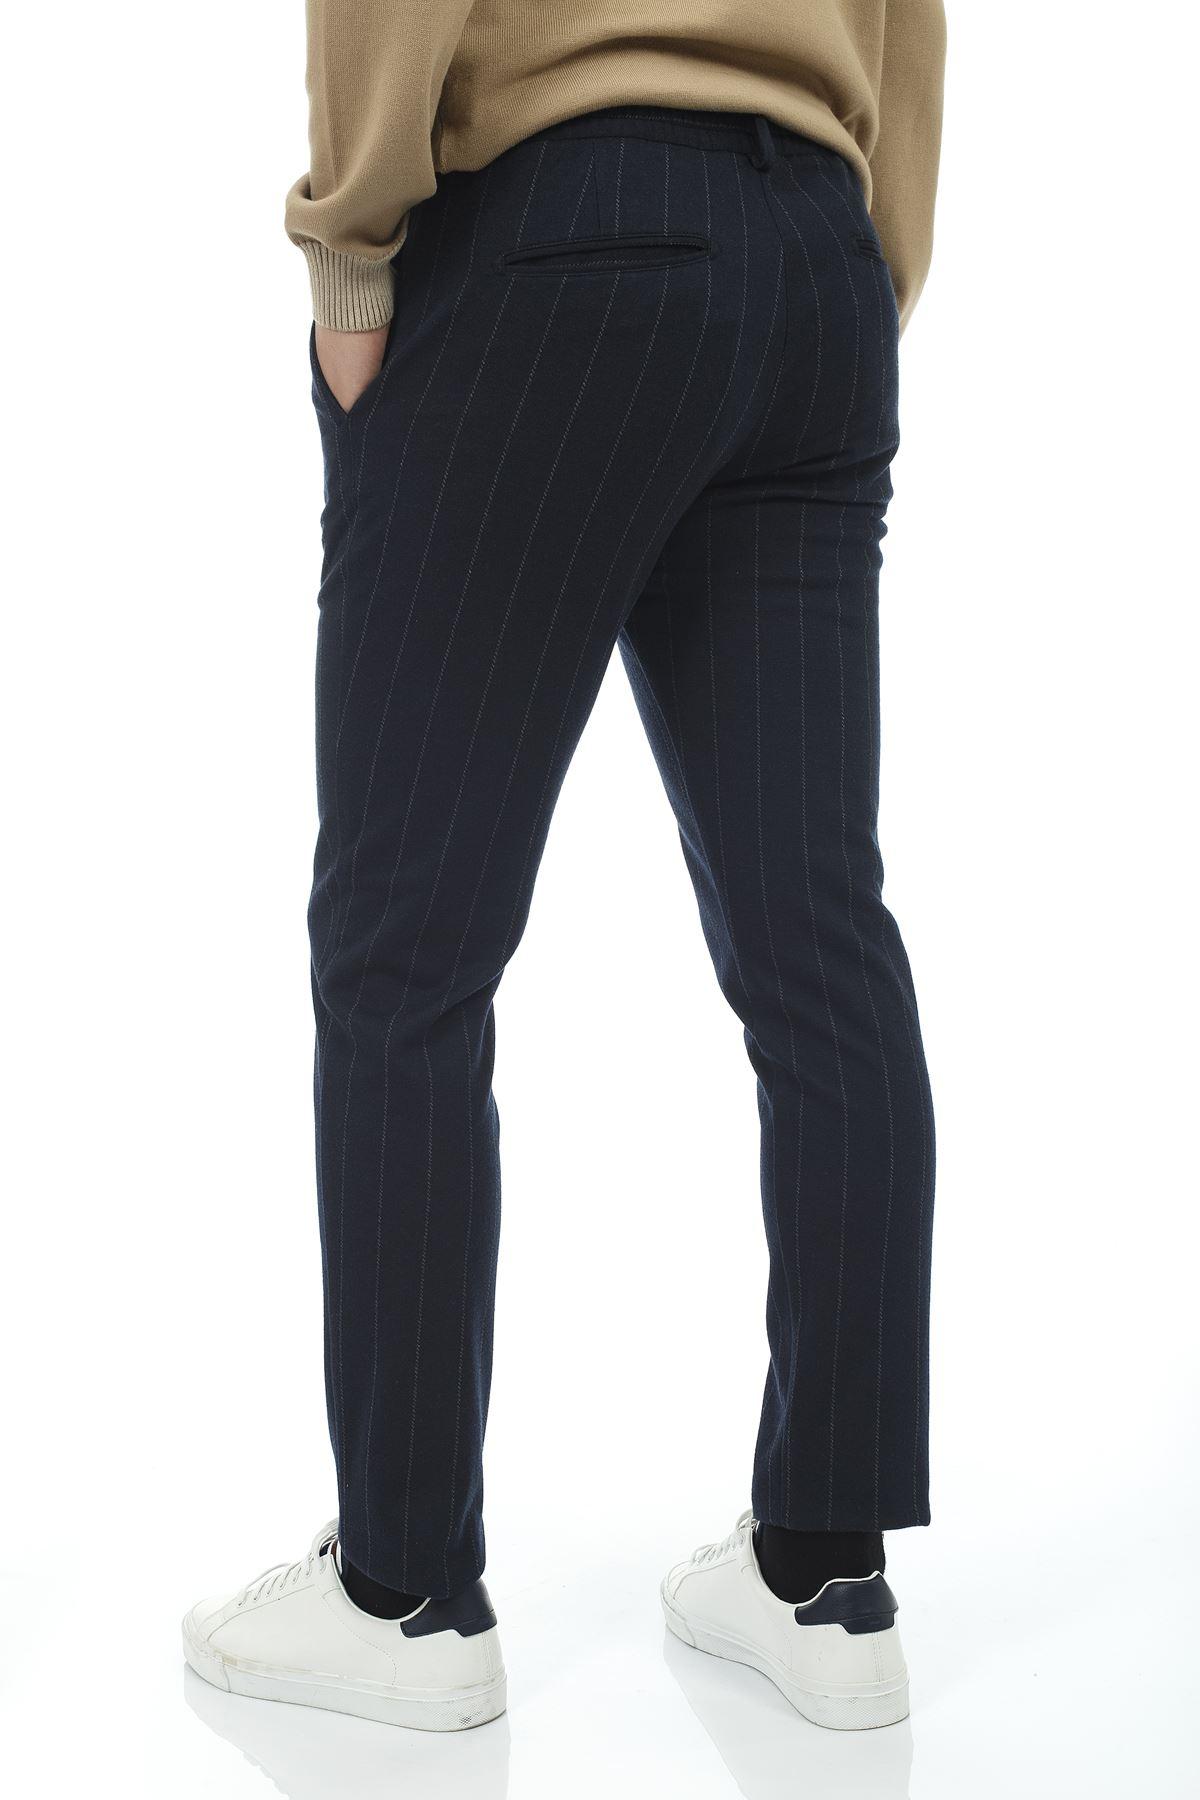 Lacivert Beyaz Çizgili Jogger Spor Pantolon